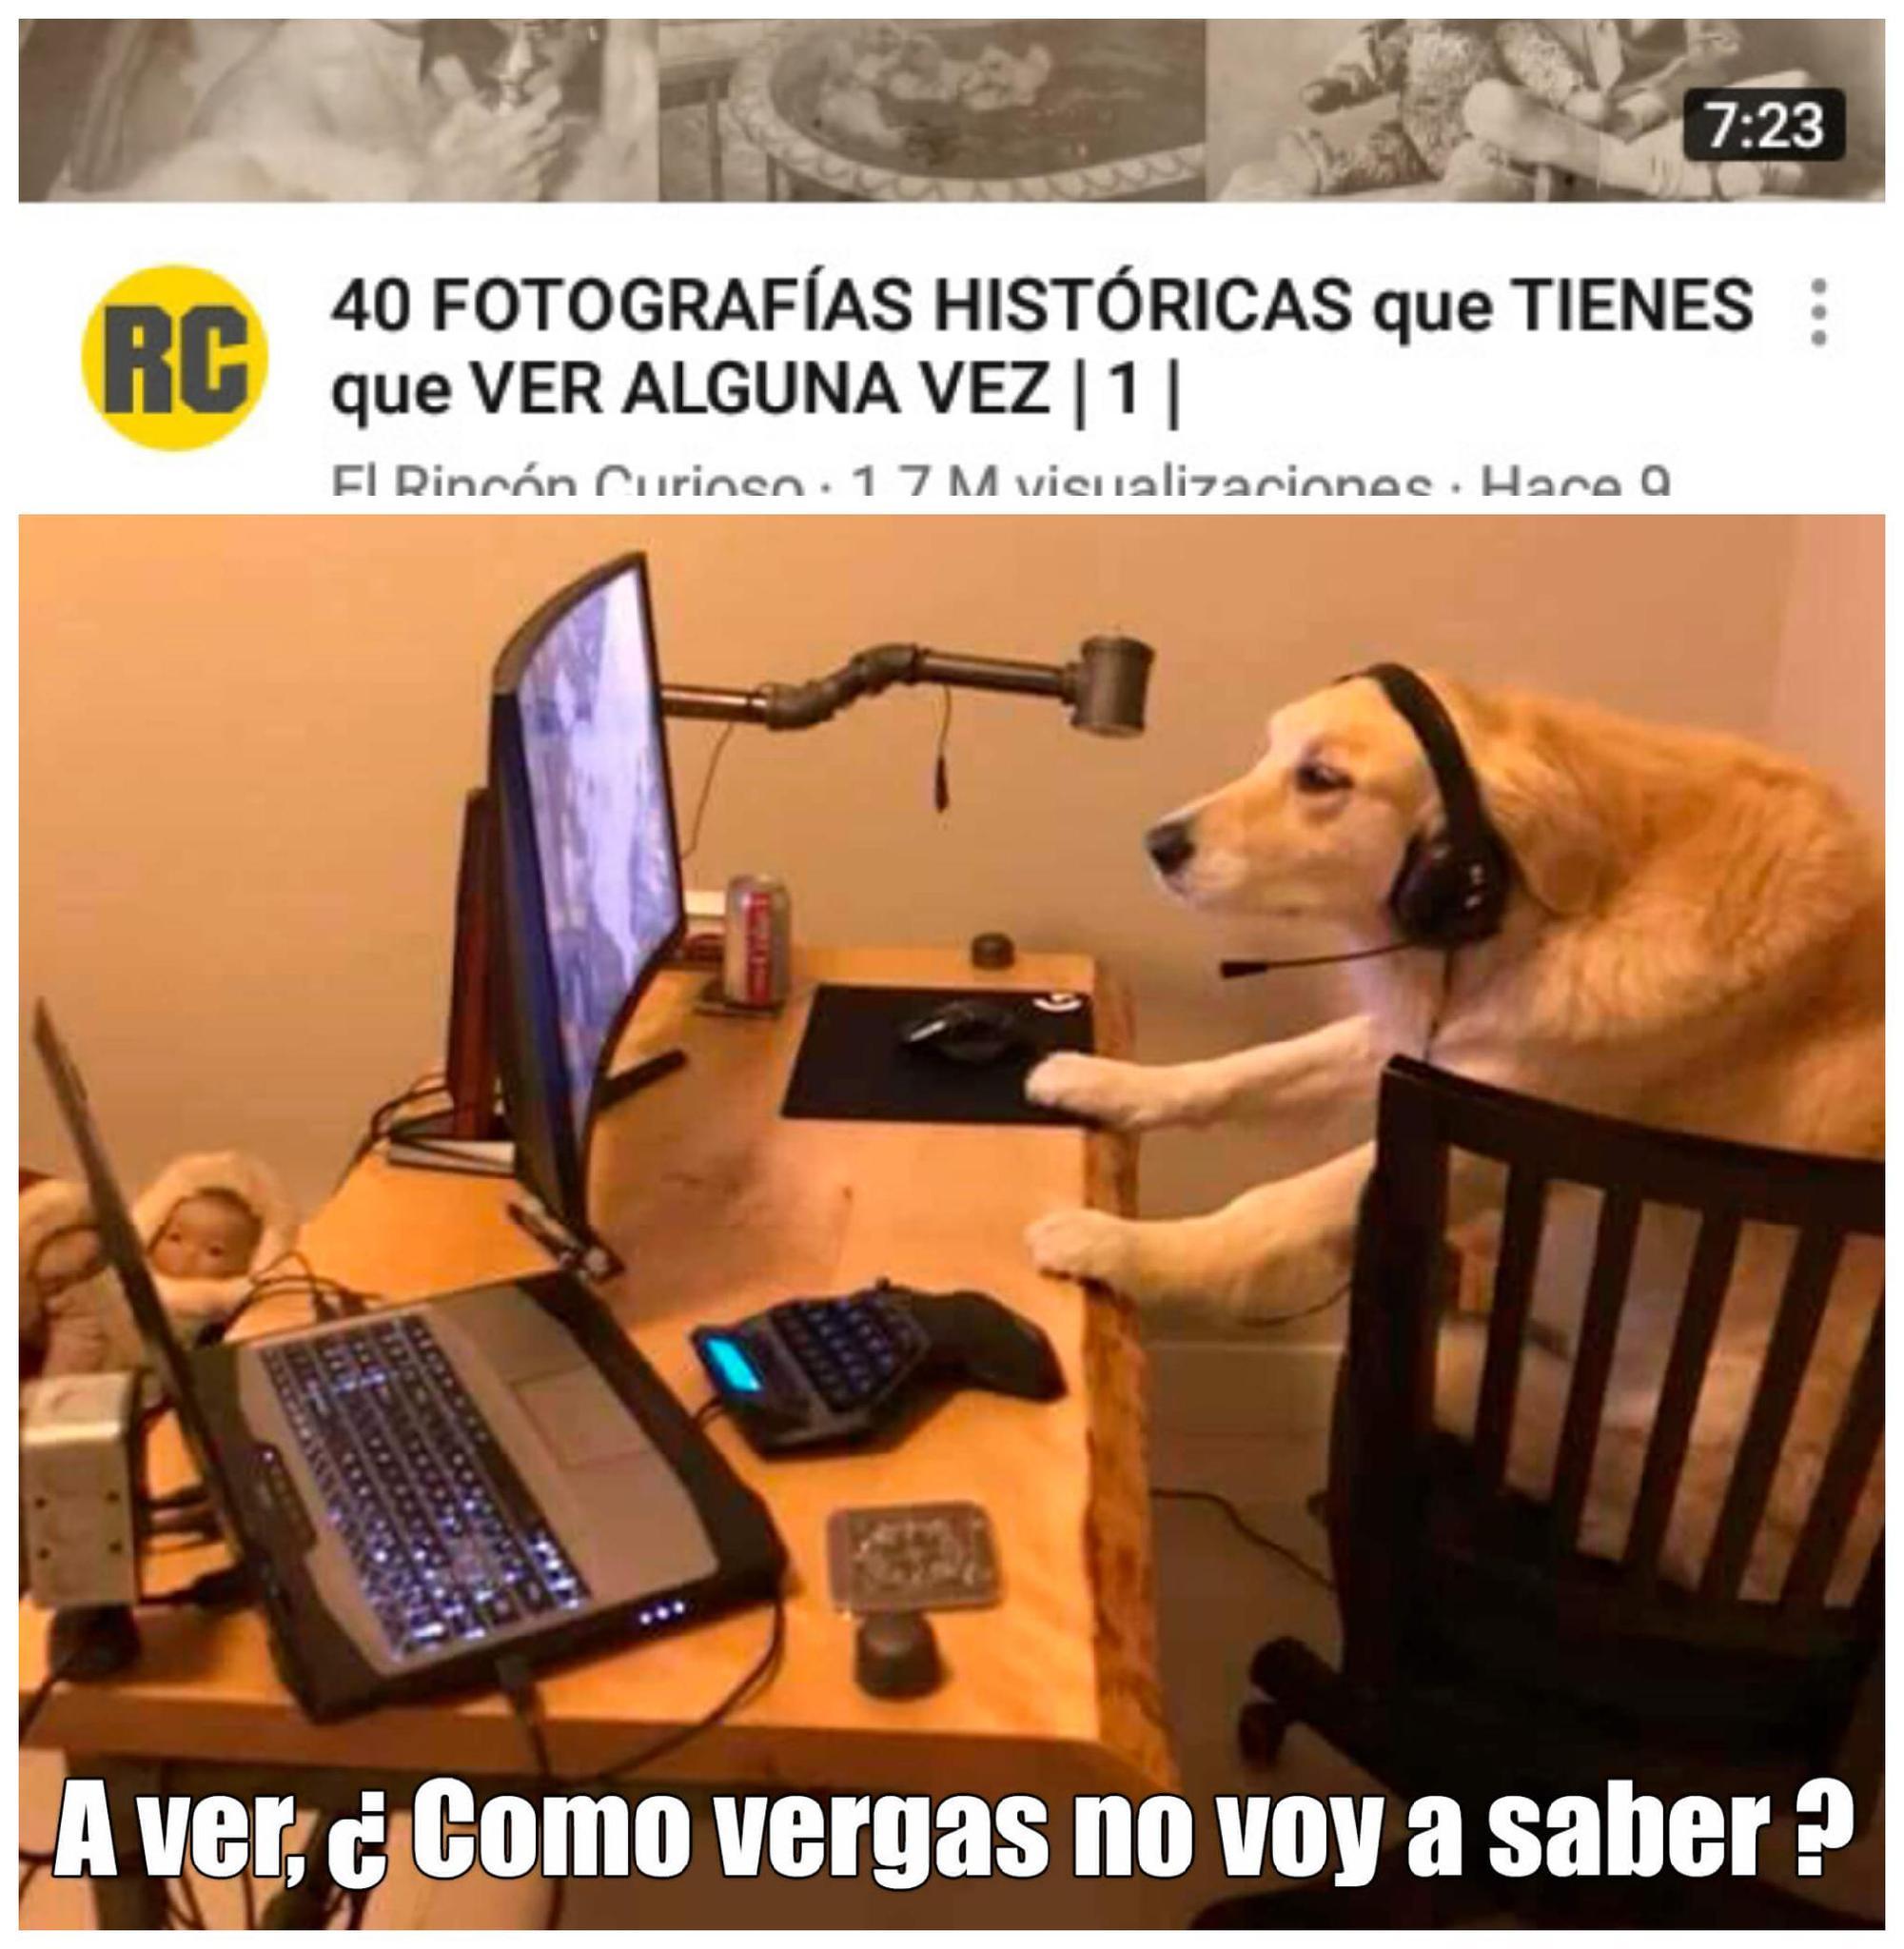 Mira el video - meme